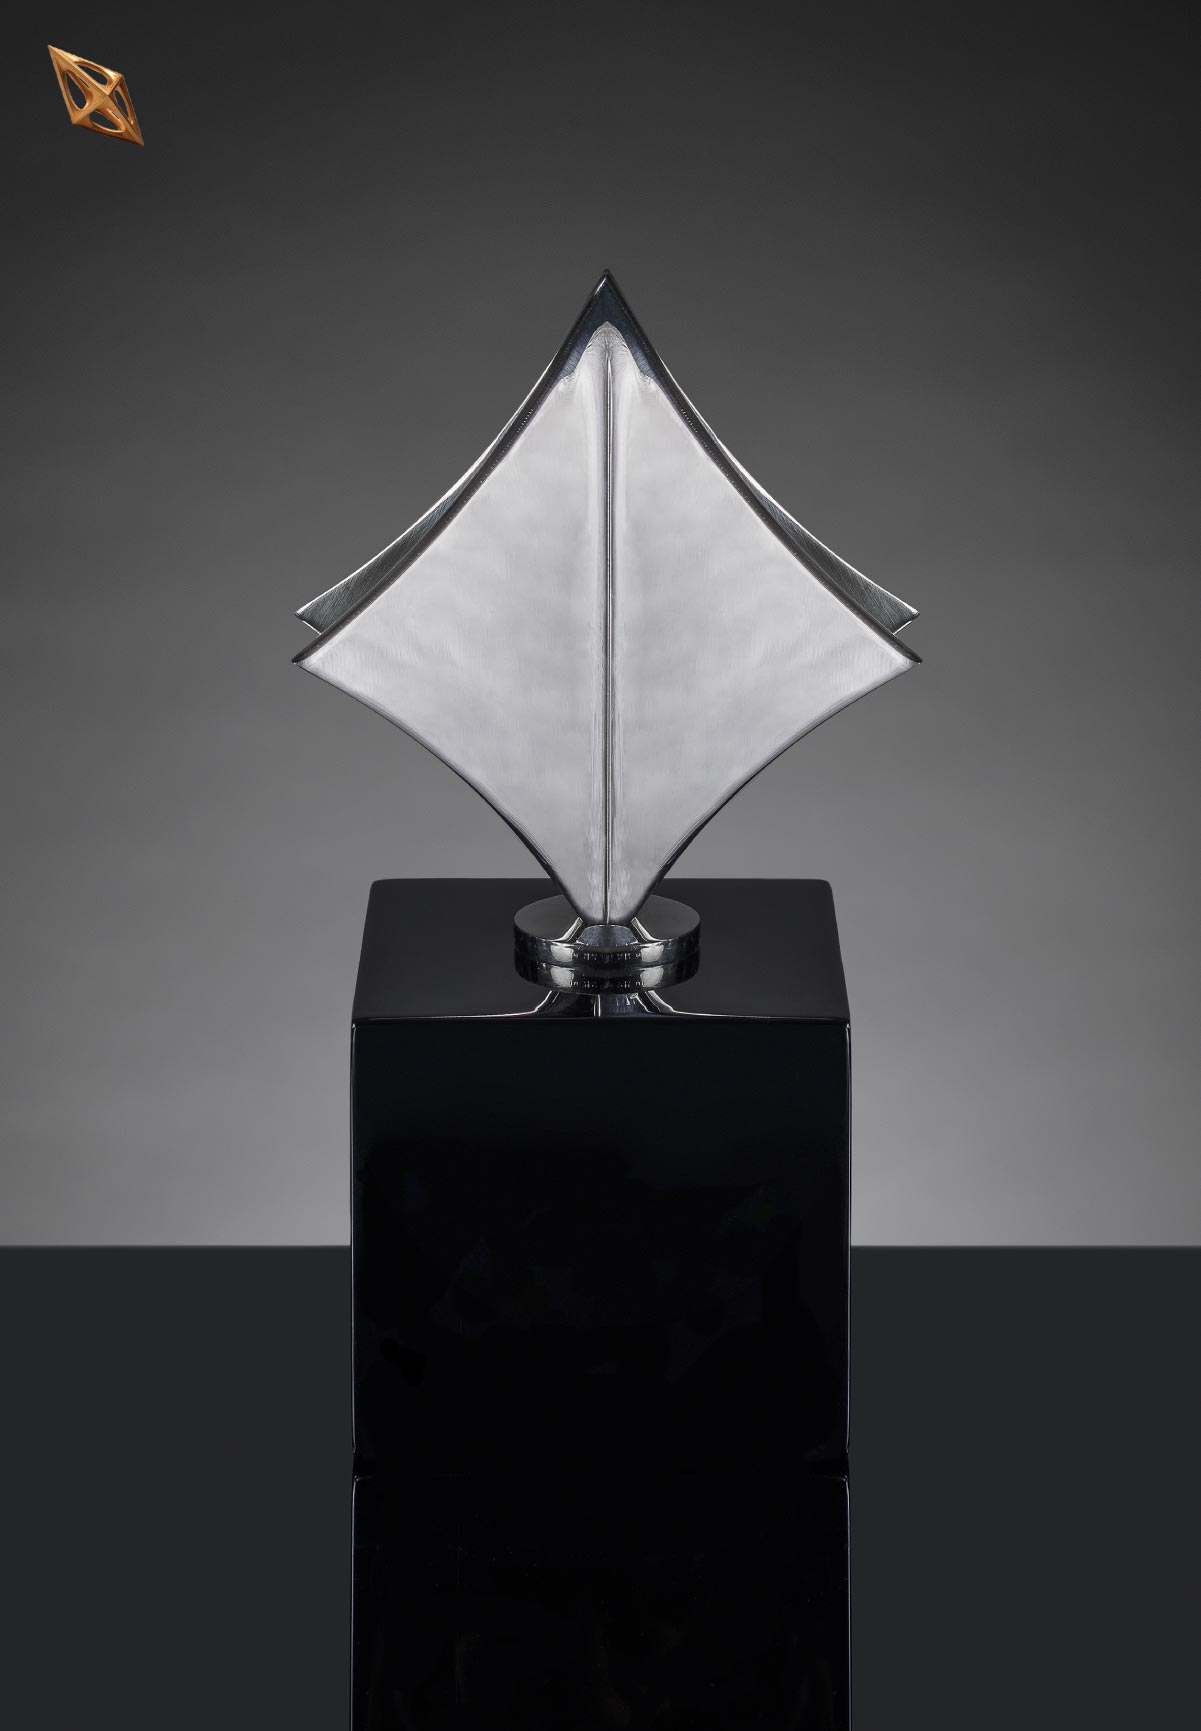 bouwebcollectionkadraj_circle coffee table-basic lamp- nero armchair copy 7